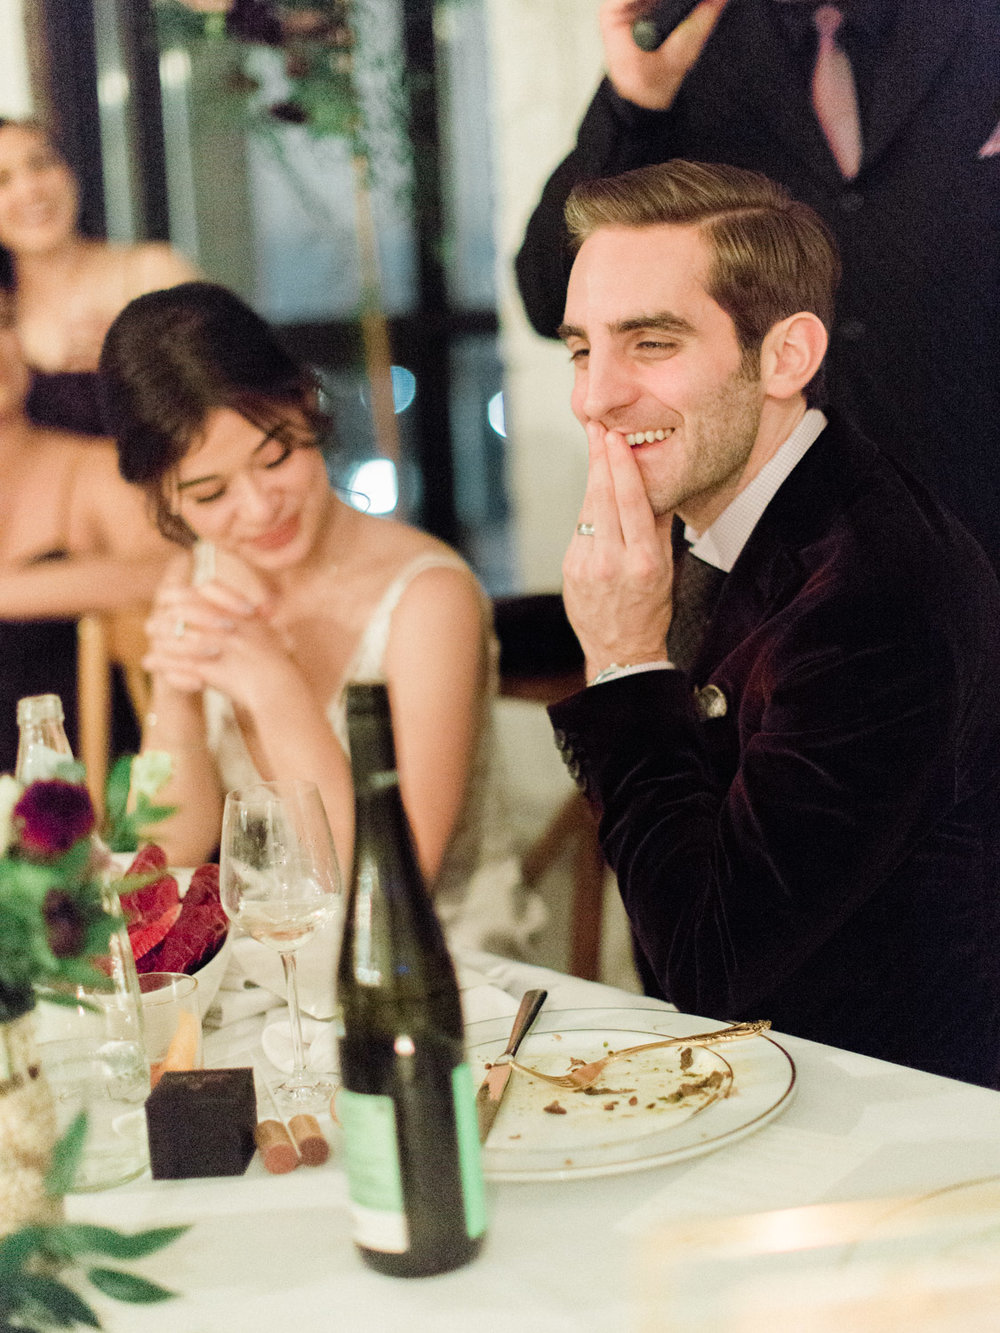 Toronto-wedding-photographer-intimate-italian-the-burroughes-downtown149.jpg